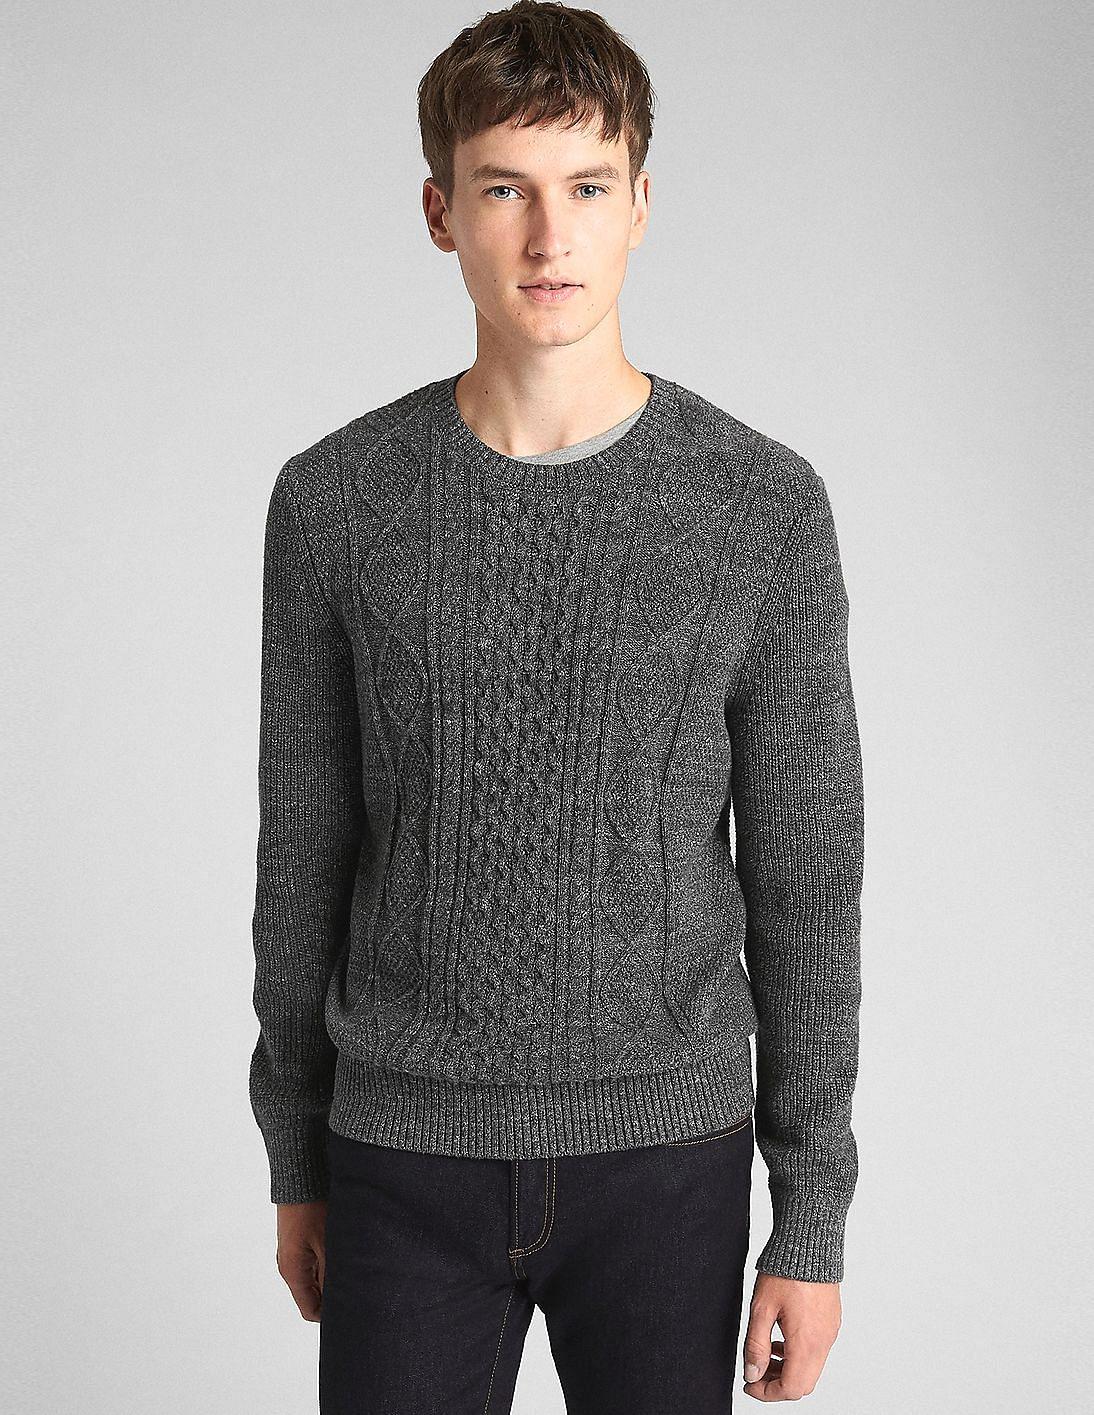 Buy Gap Men Men Grey Cable Knit Crewneck Pullover Sweater Nnnow Com